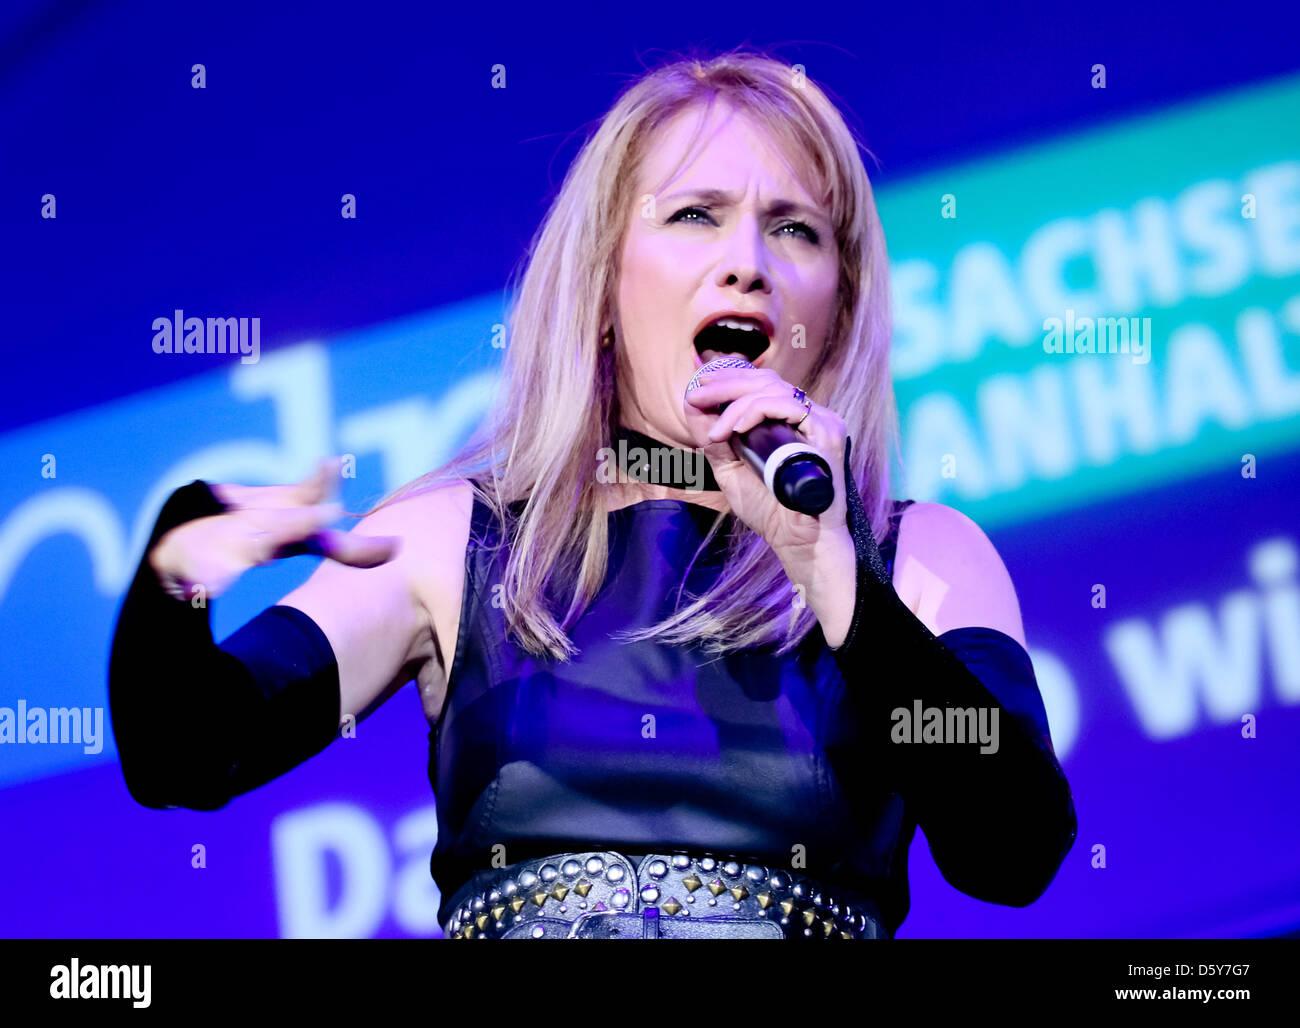 Folk singer Nicole peforms on stage at the folk music parade of the radio station MDR Saxony-Anhalt at GETEC Arena - Stock Image